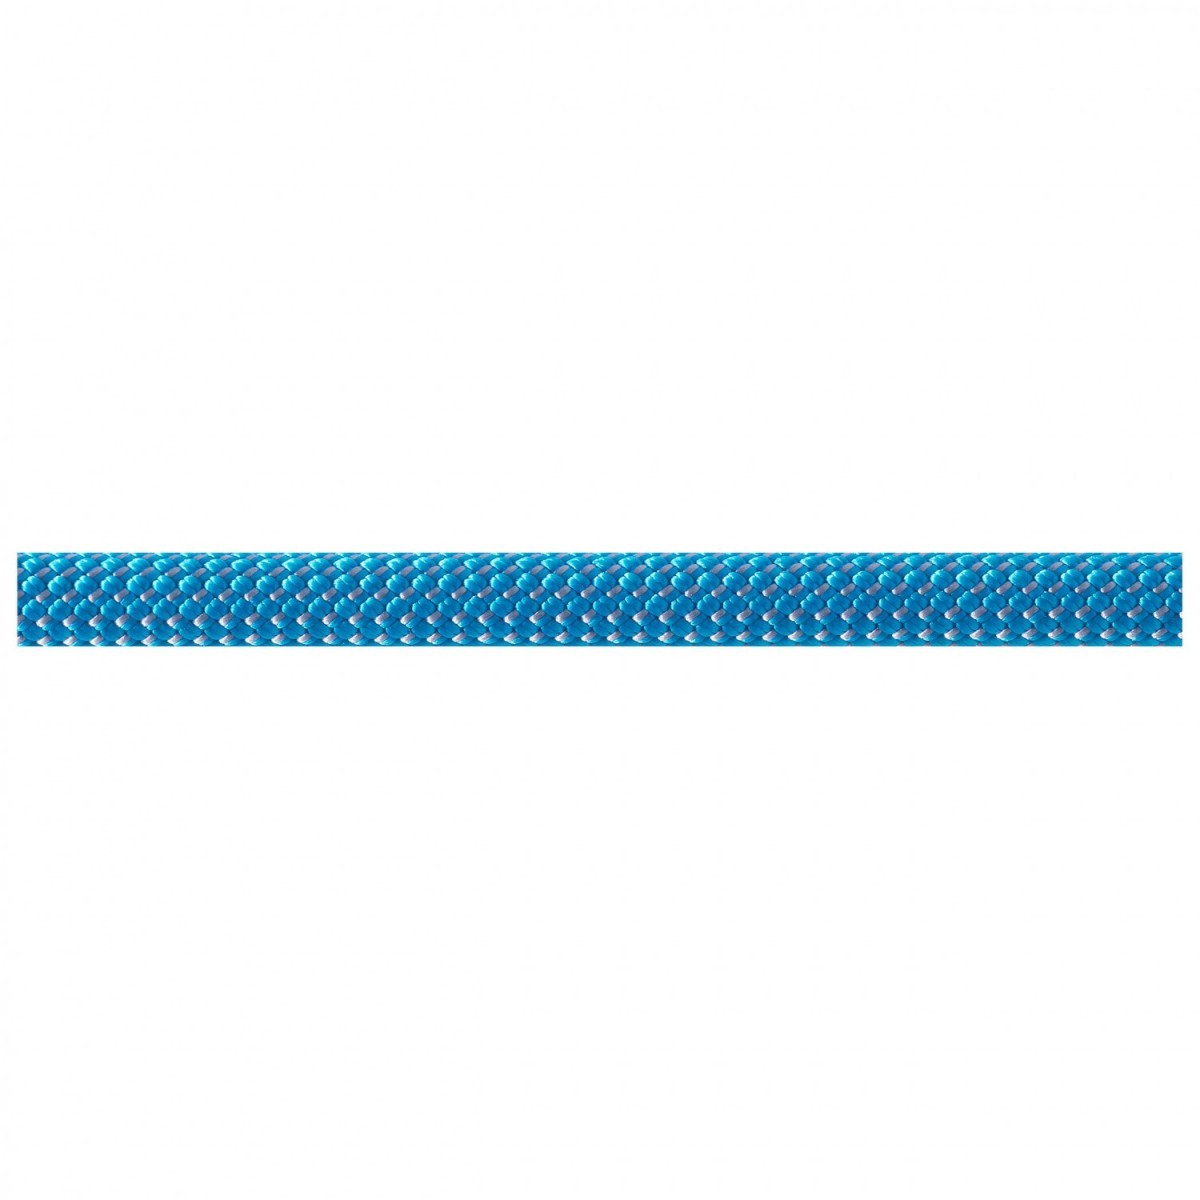 BEAL べアール Joker 9.1 mm Golden Dry(50m -  Blue)★ロープ・ザイル・登山・クライミング★